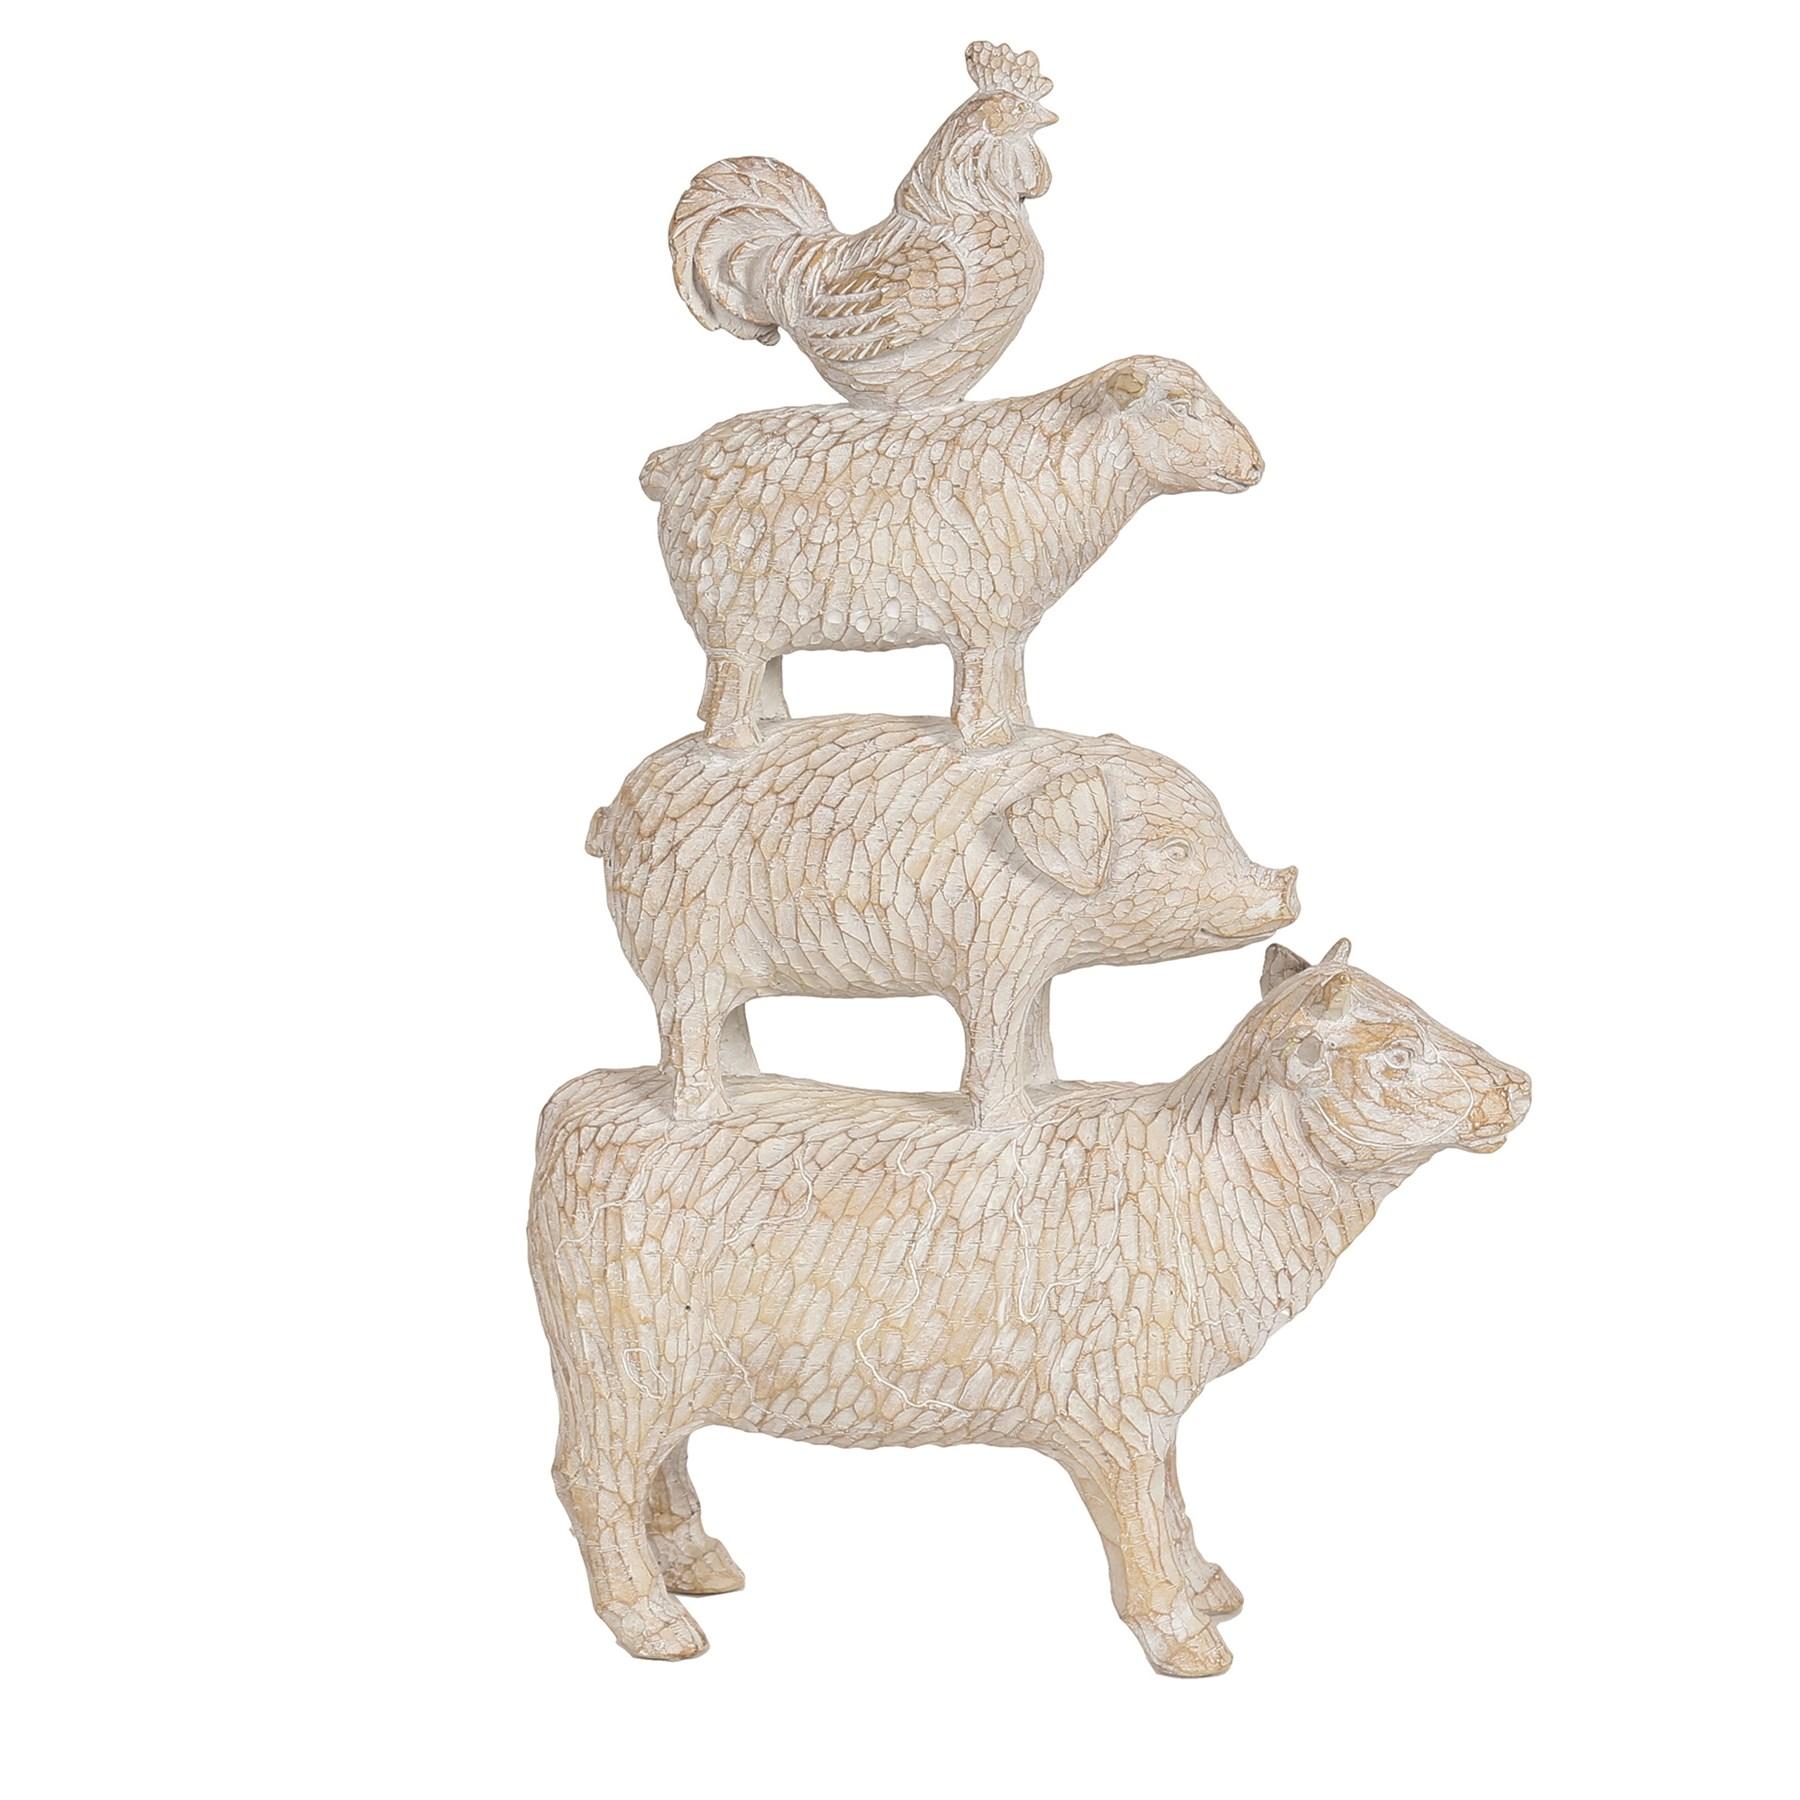 Animal Figurines 38.5cm